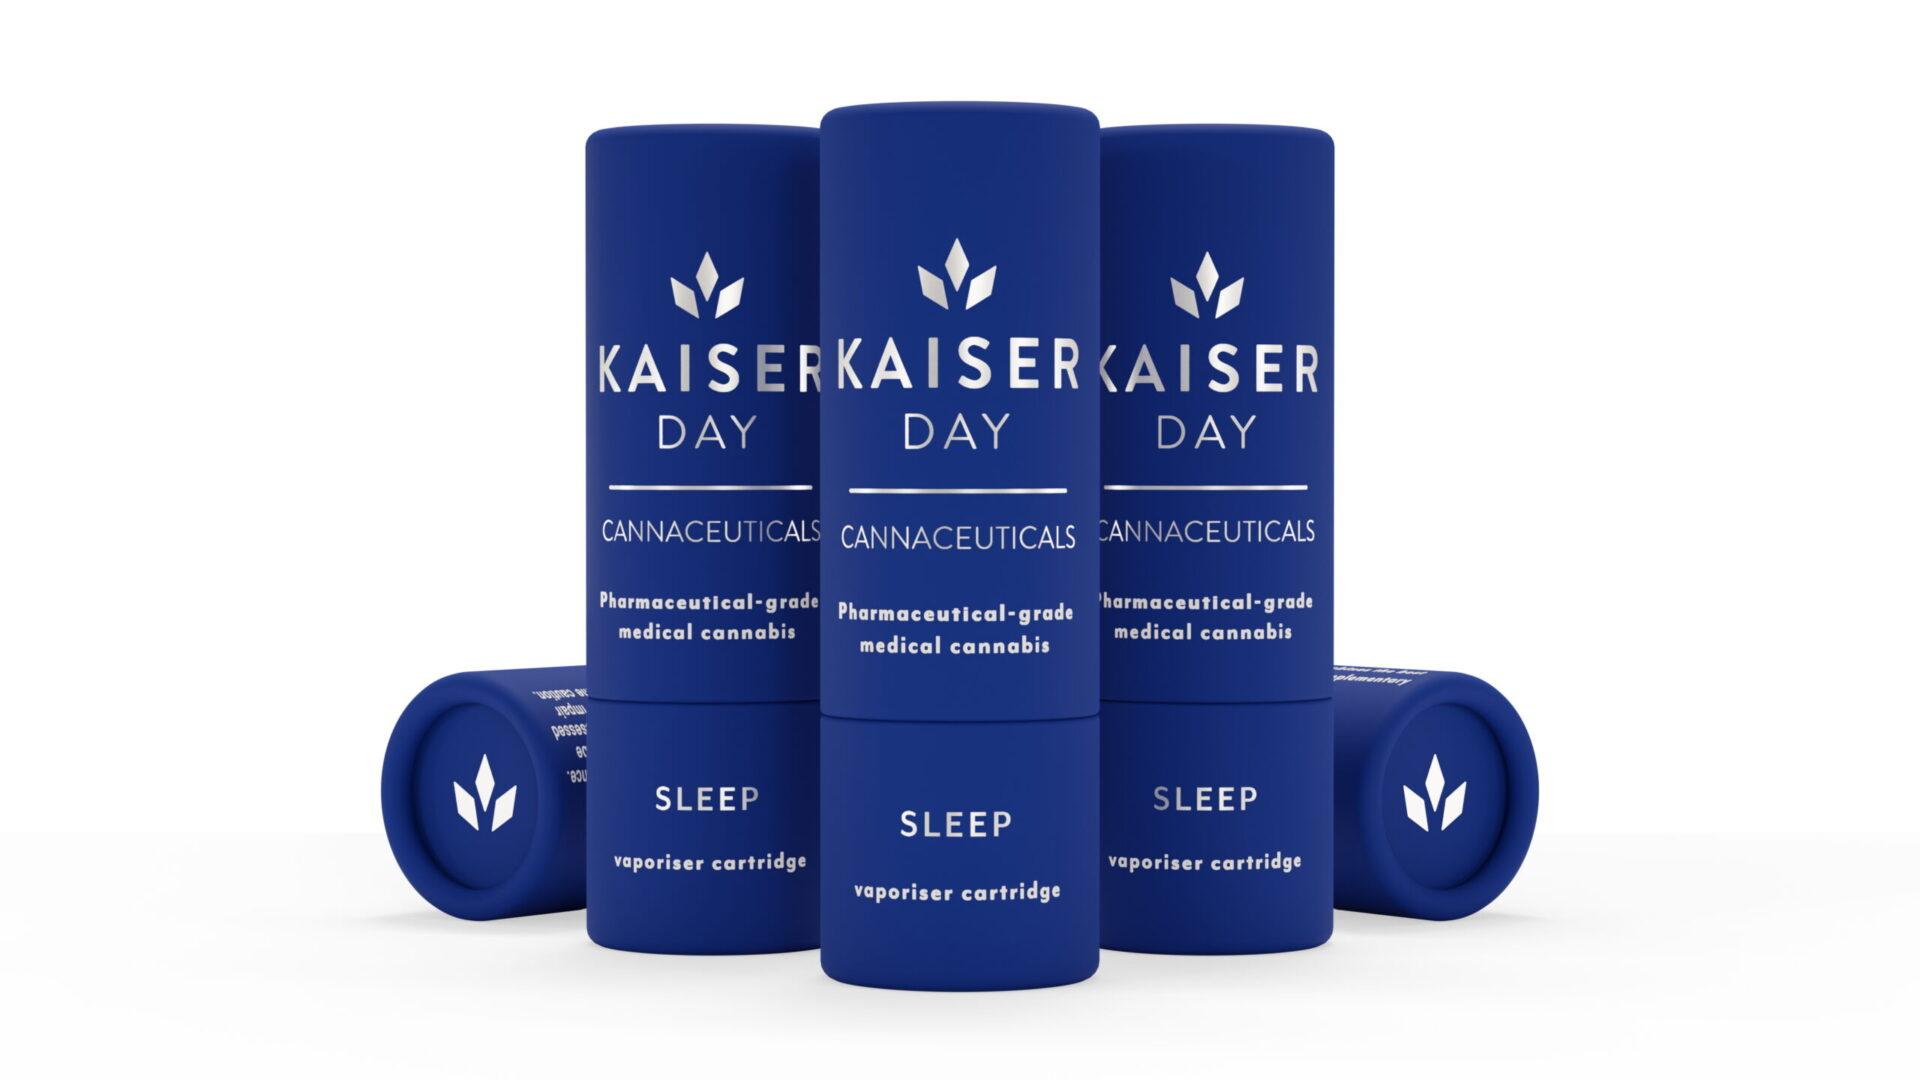 Kaiser Day CannaceuticalsMedical Cannabis Solutions